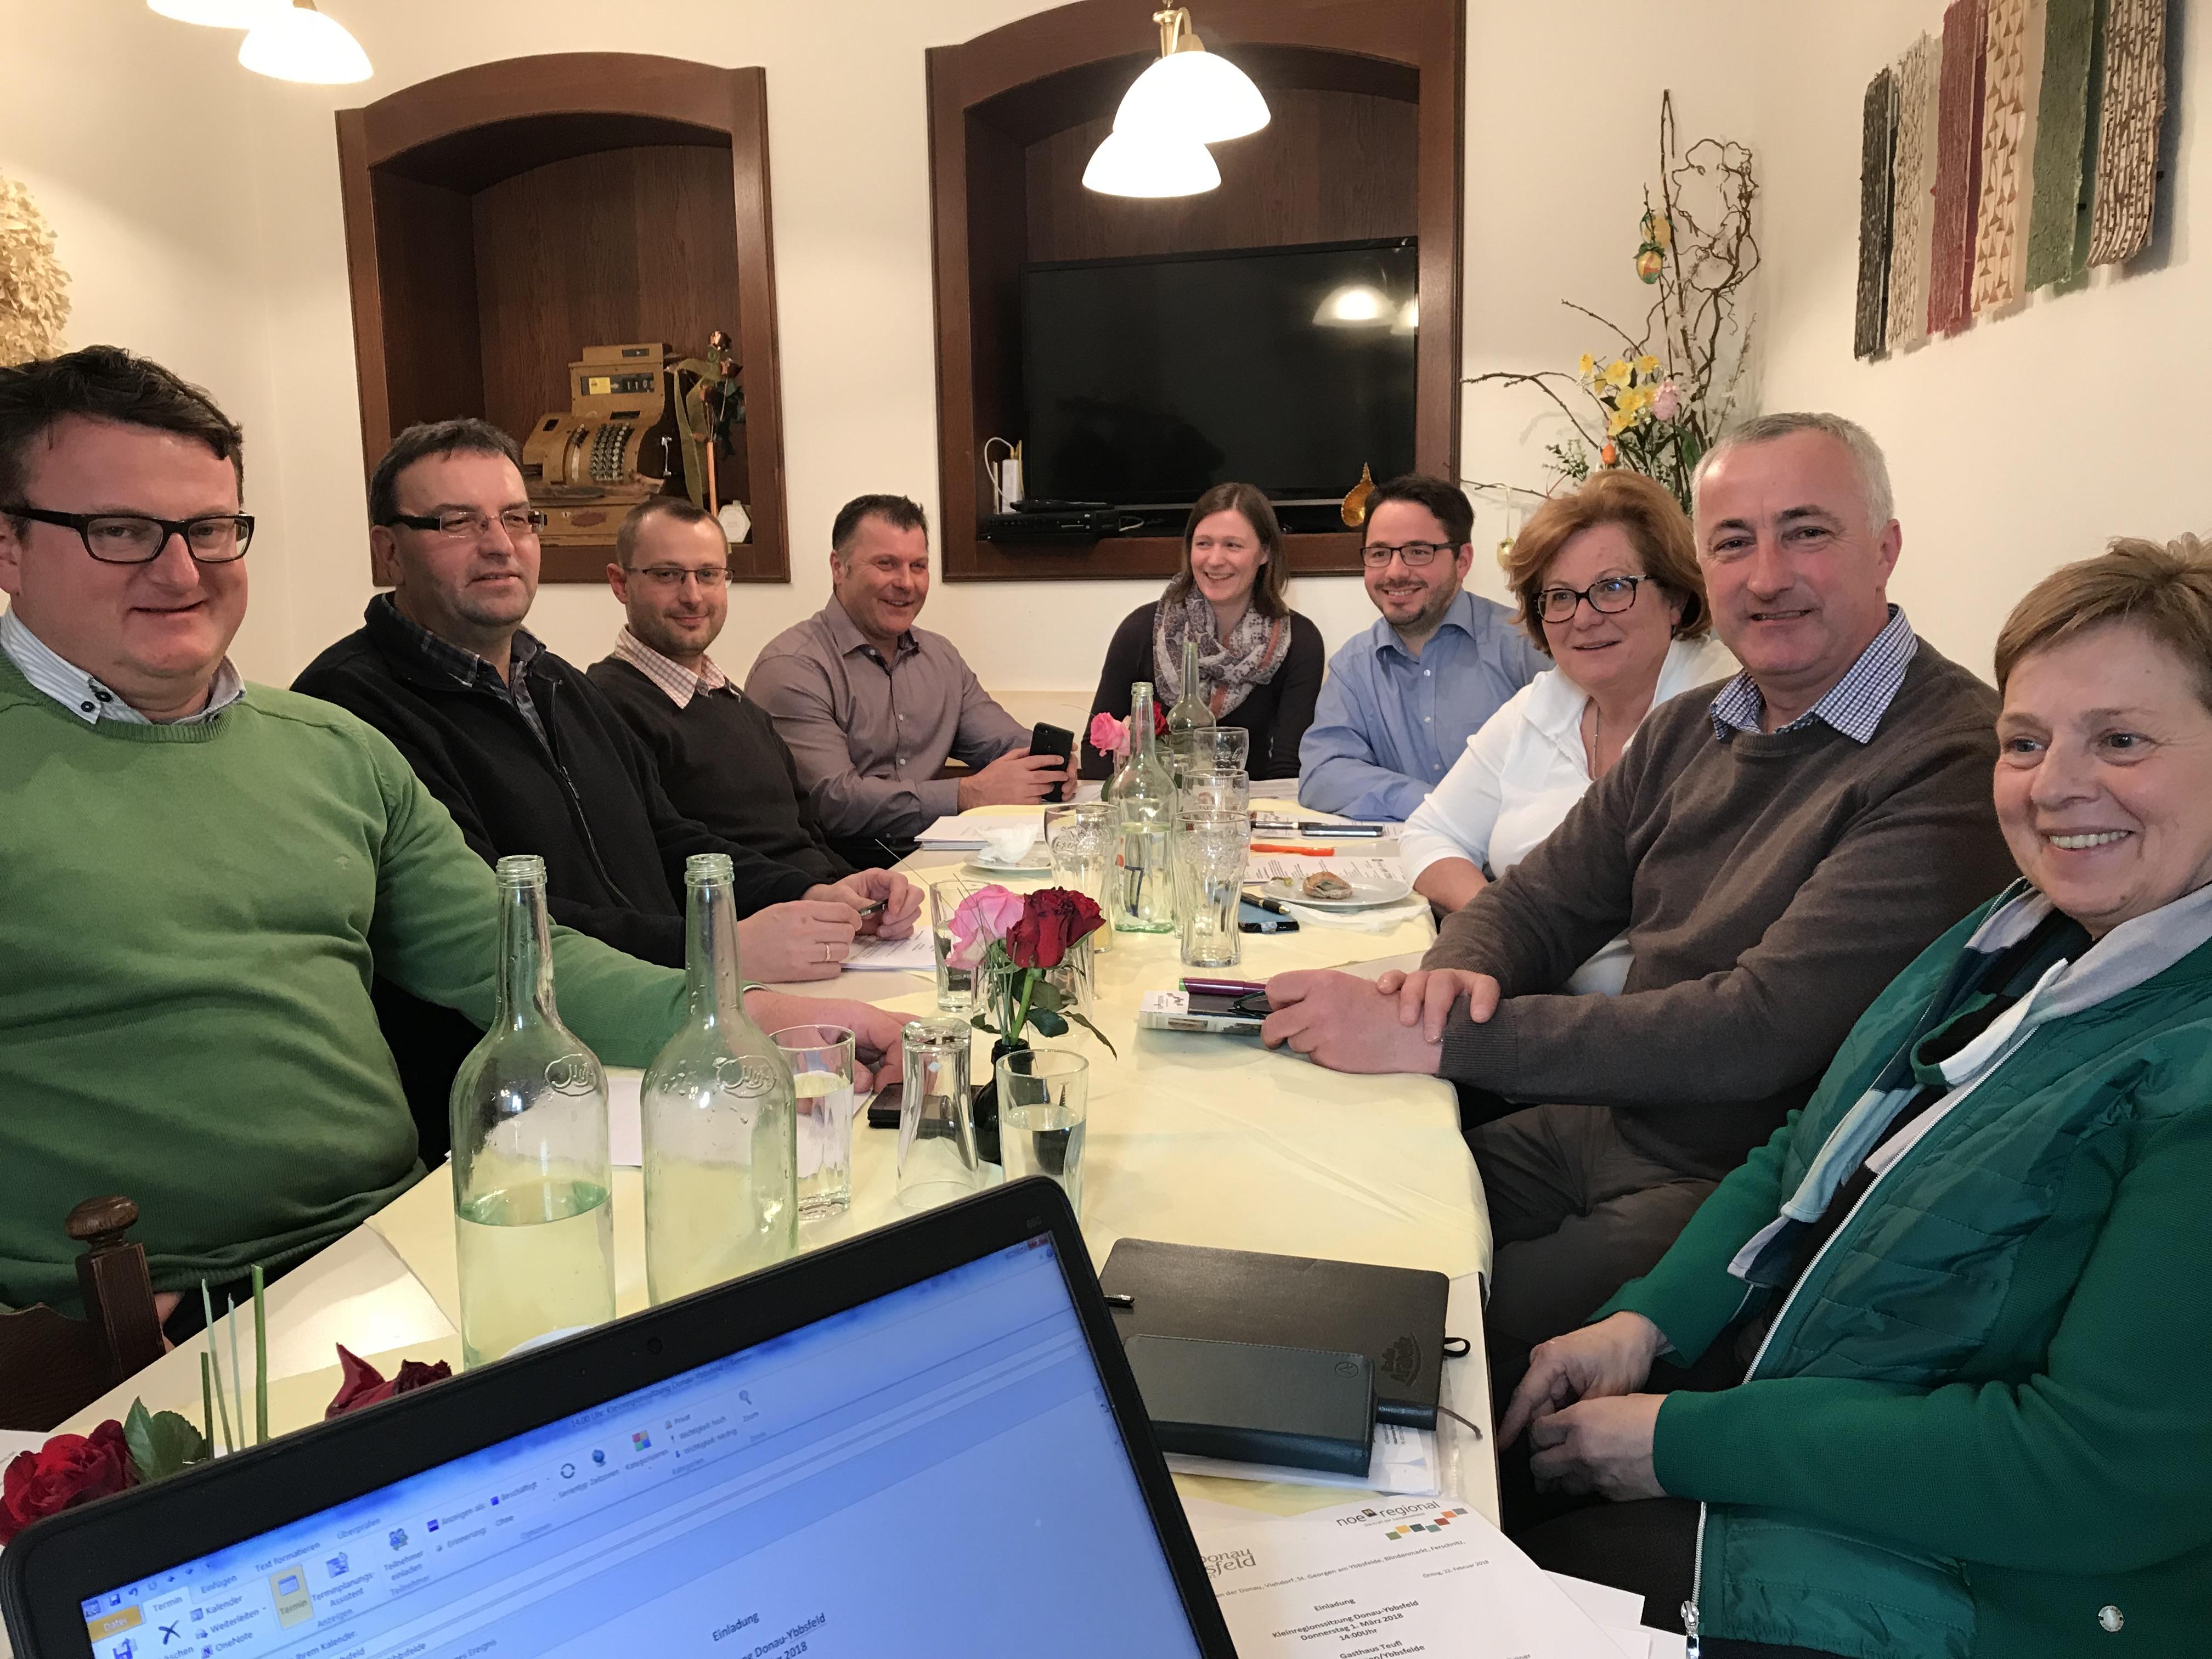 Hof bei salzburg single mann - Singles umgebung